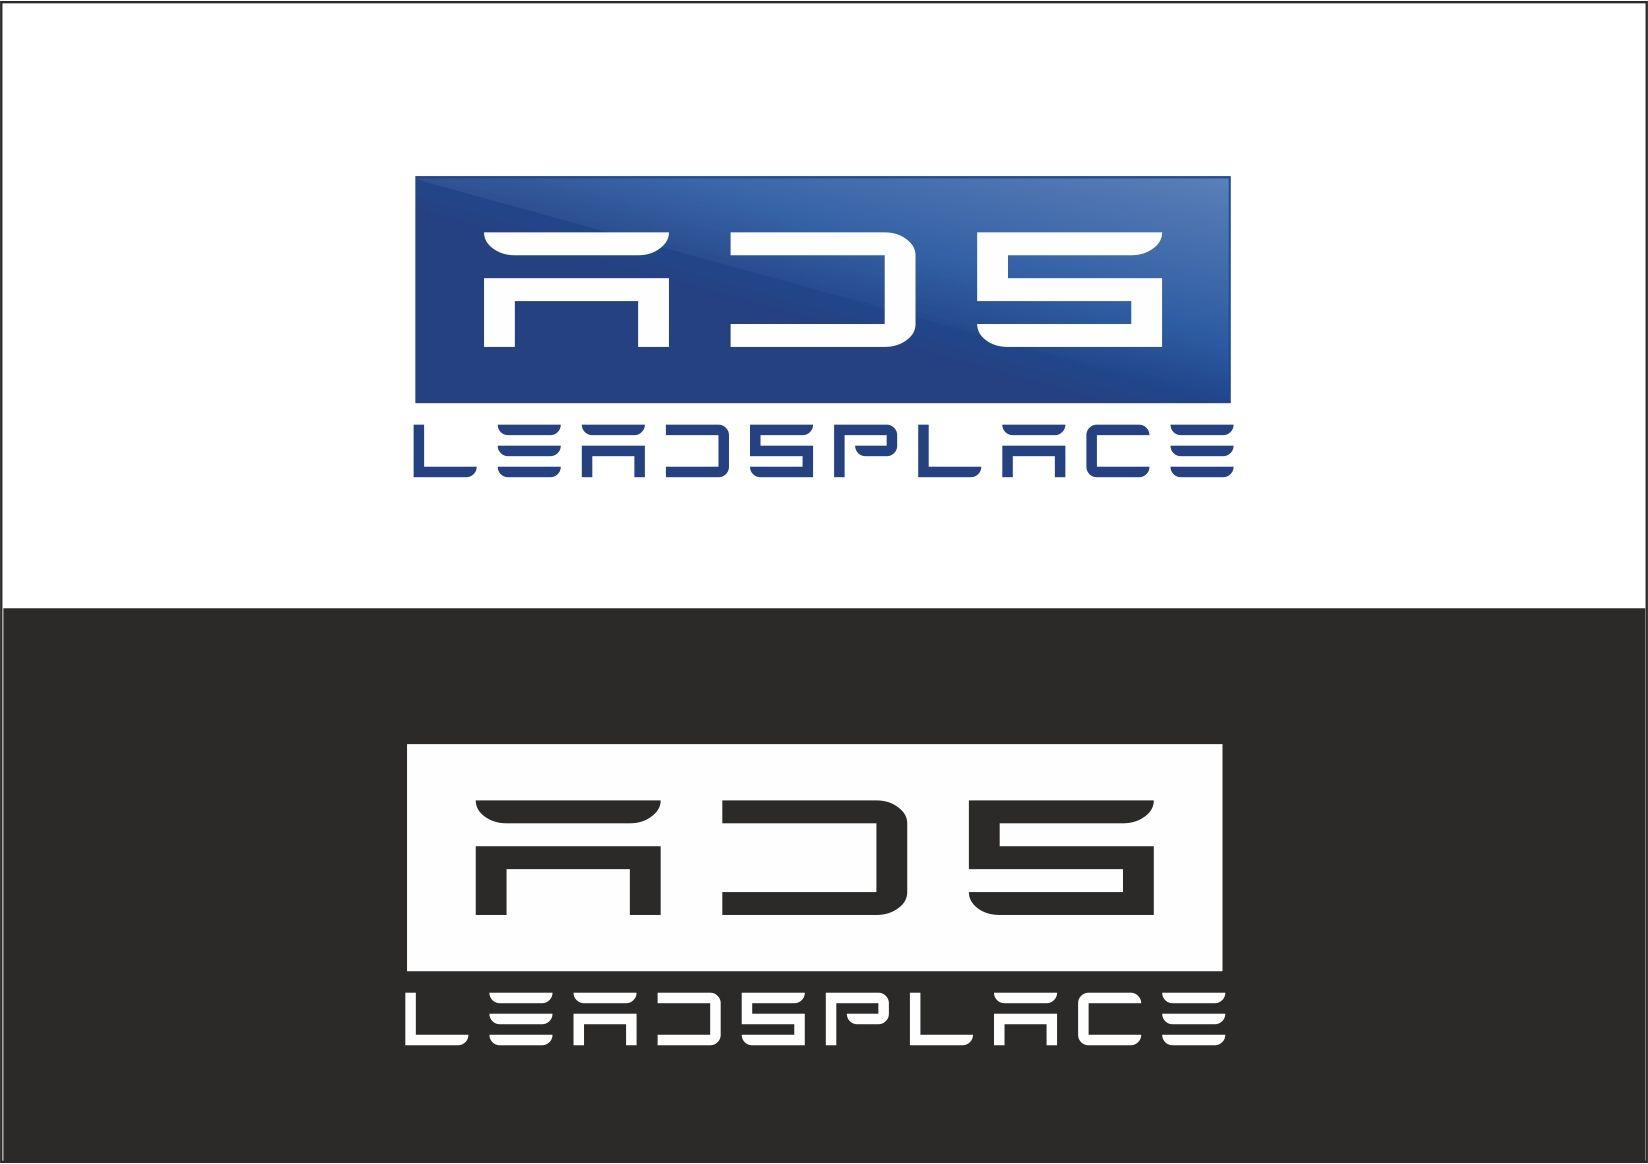 leadsplace.com - логотип - дизайнер KylTas